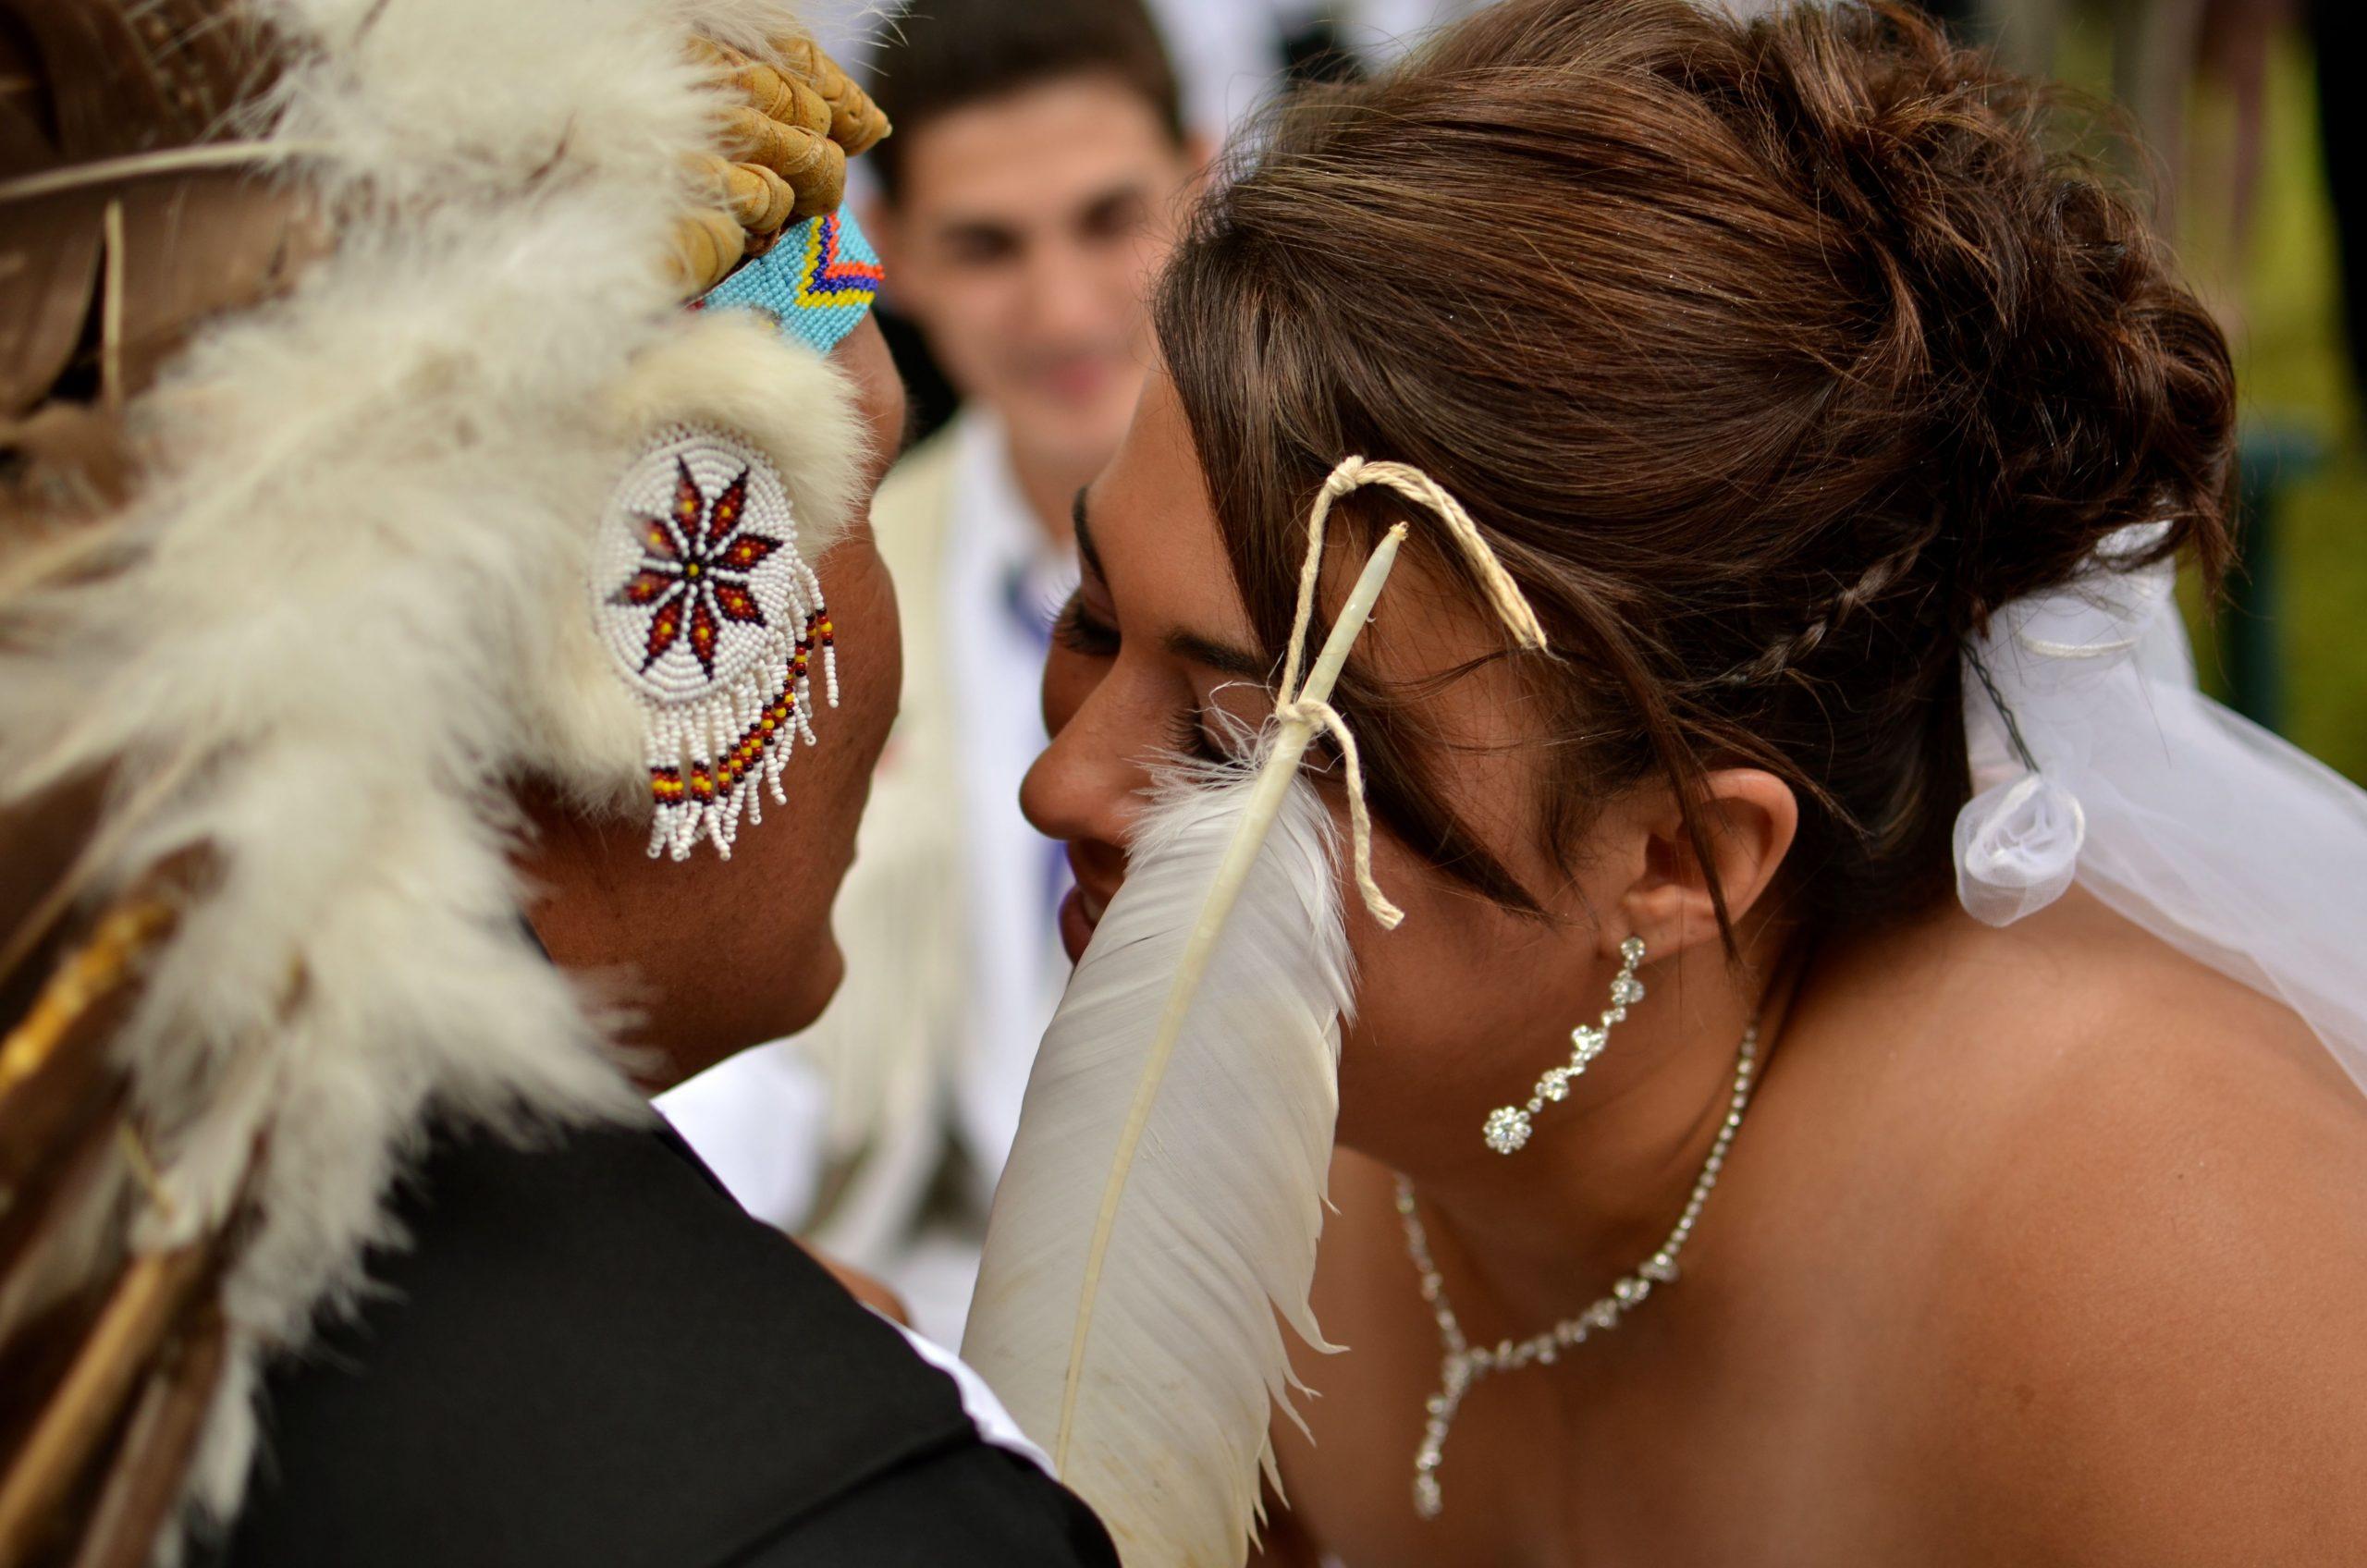 L'nu Mi'kmaw wedding in Miawpukek First Nation held by Chief Joe. Photo by: John Jeddore